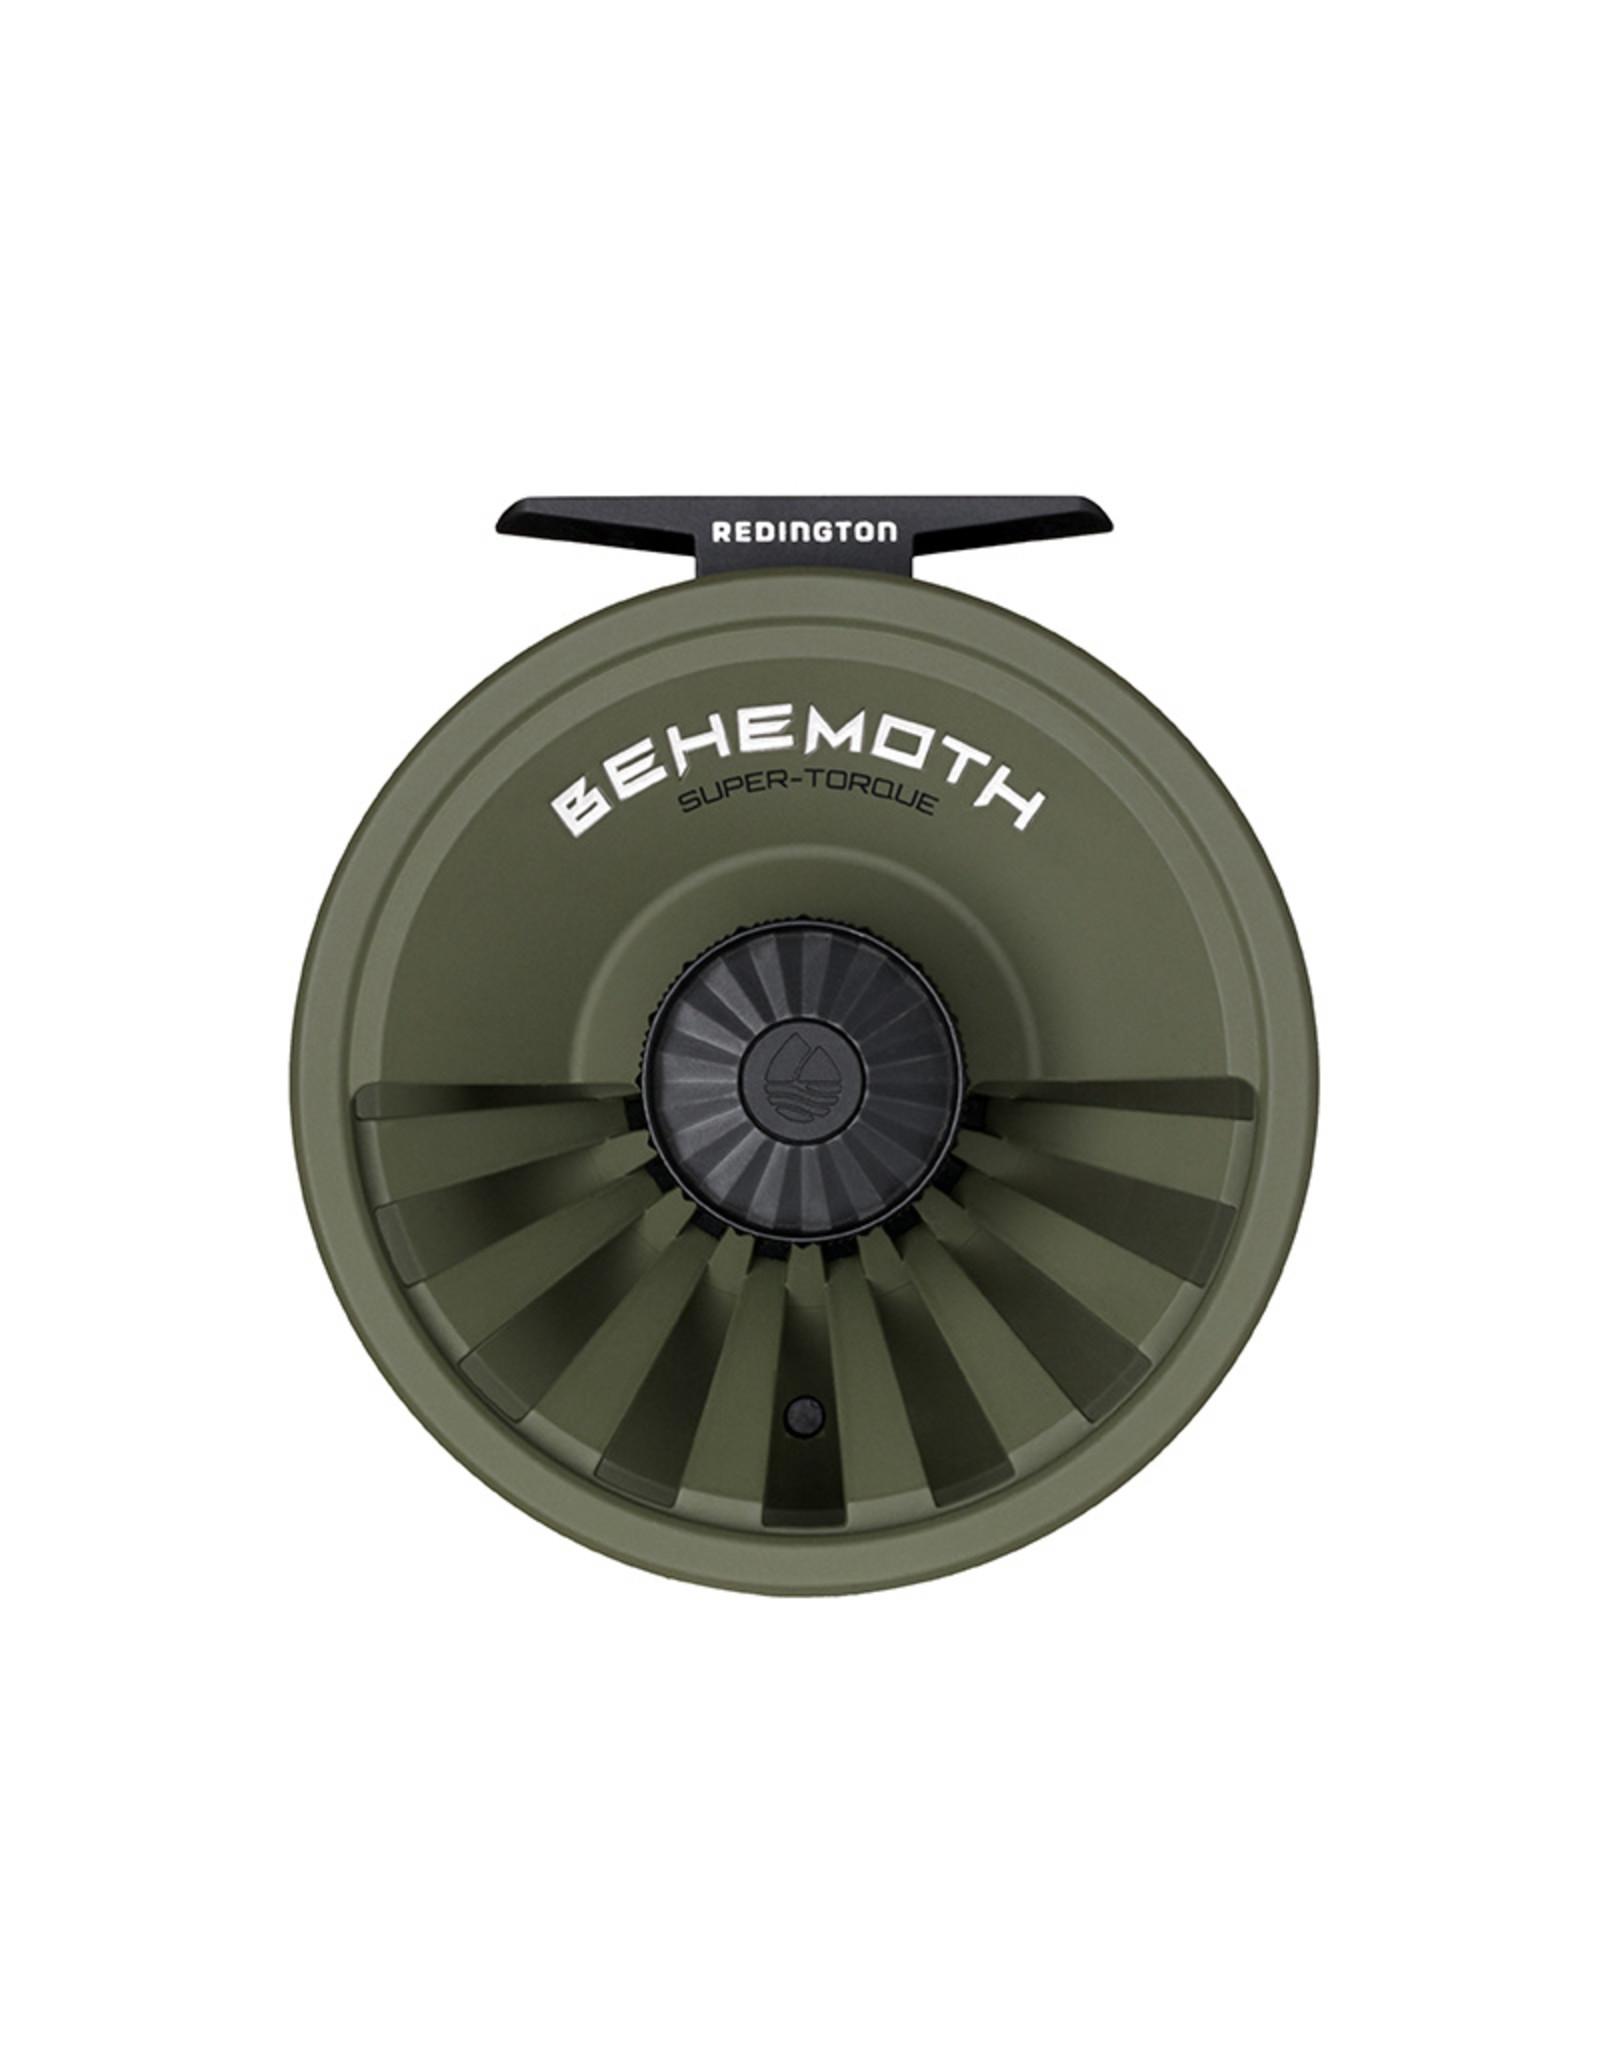 Redington Behemoth